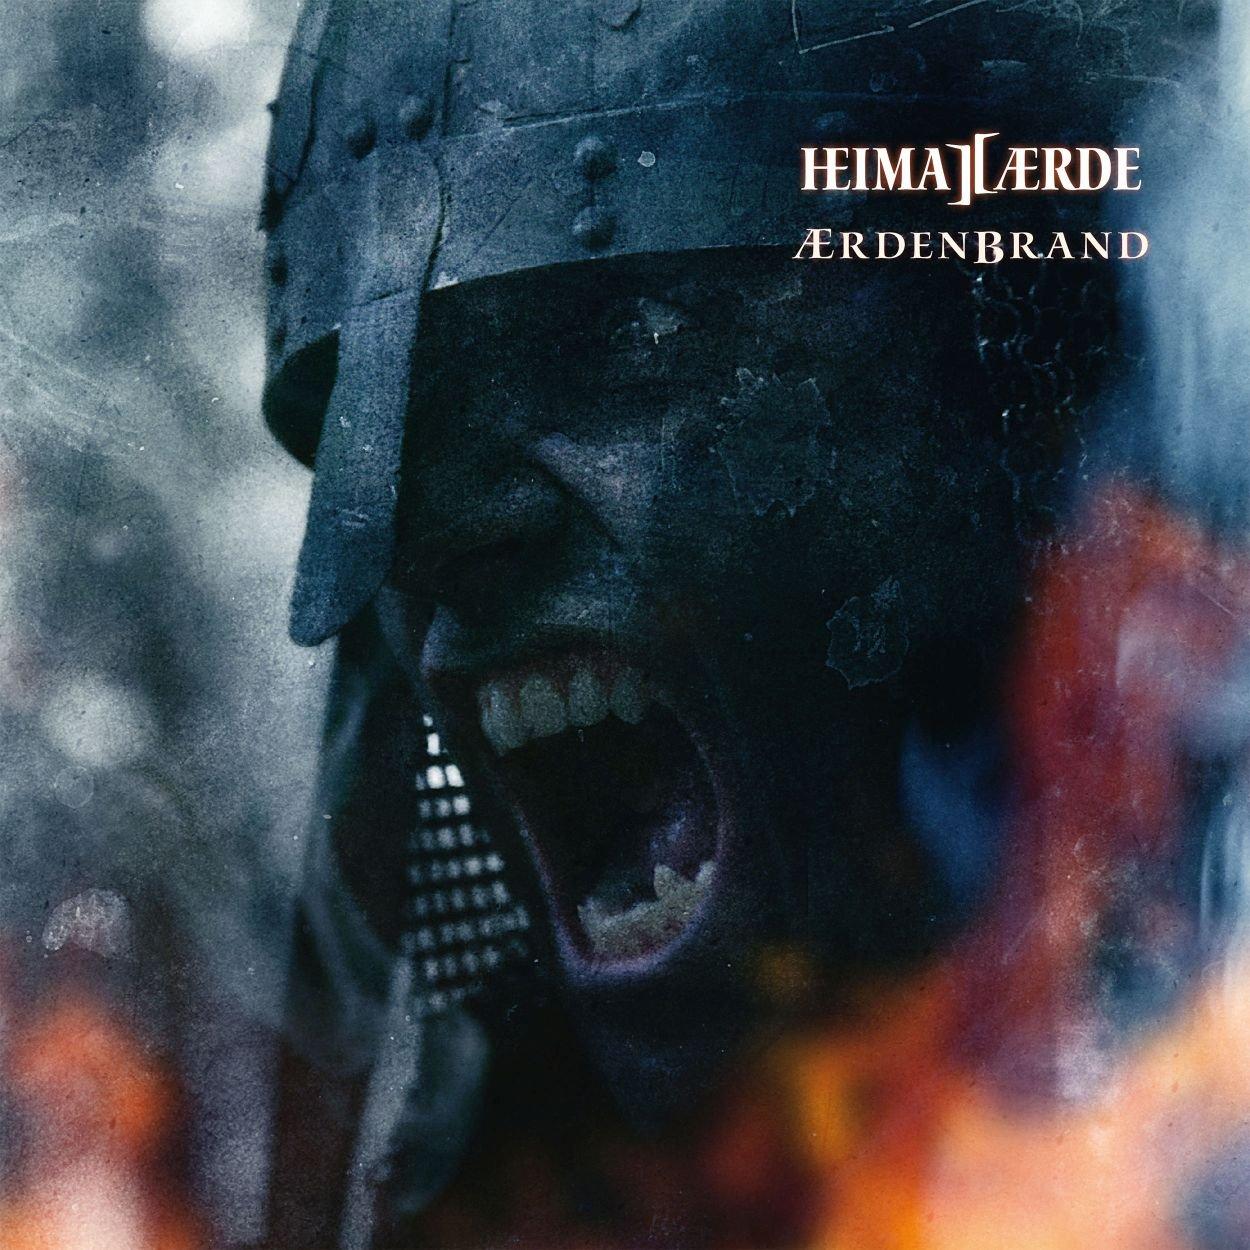 heimataerde_aerdenbrand